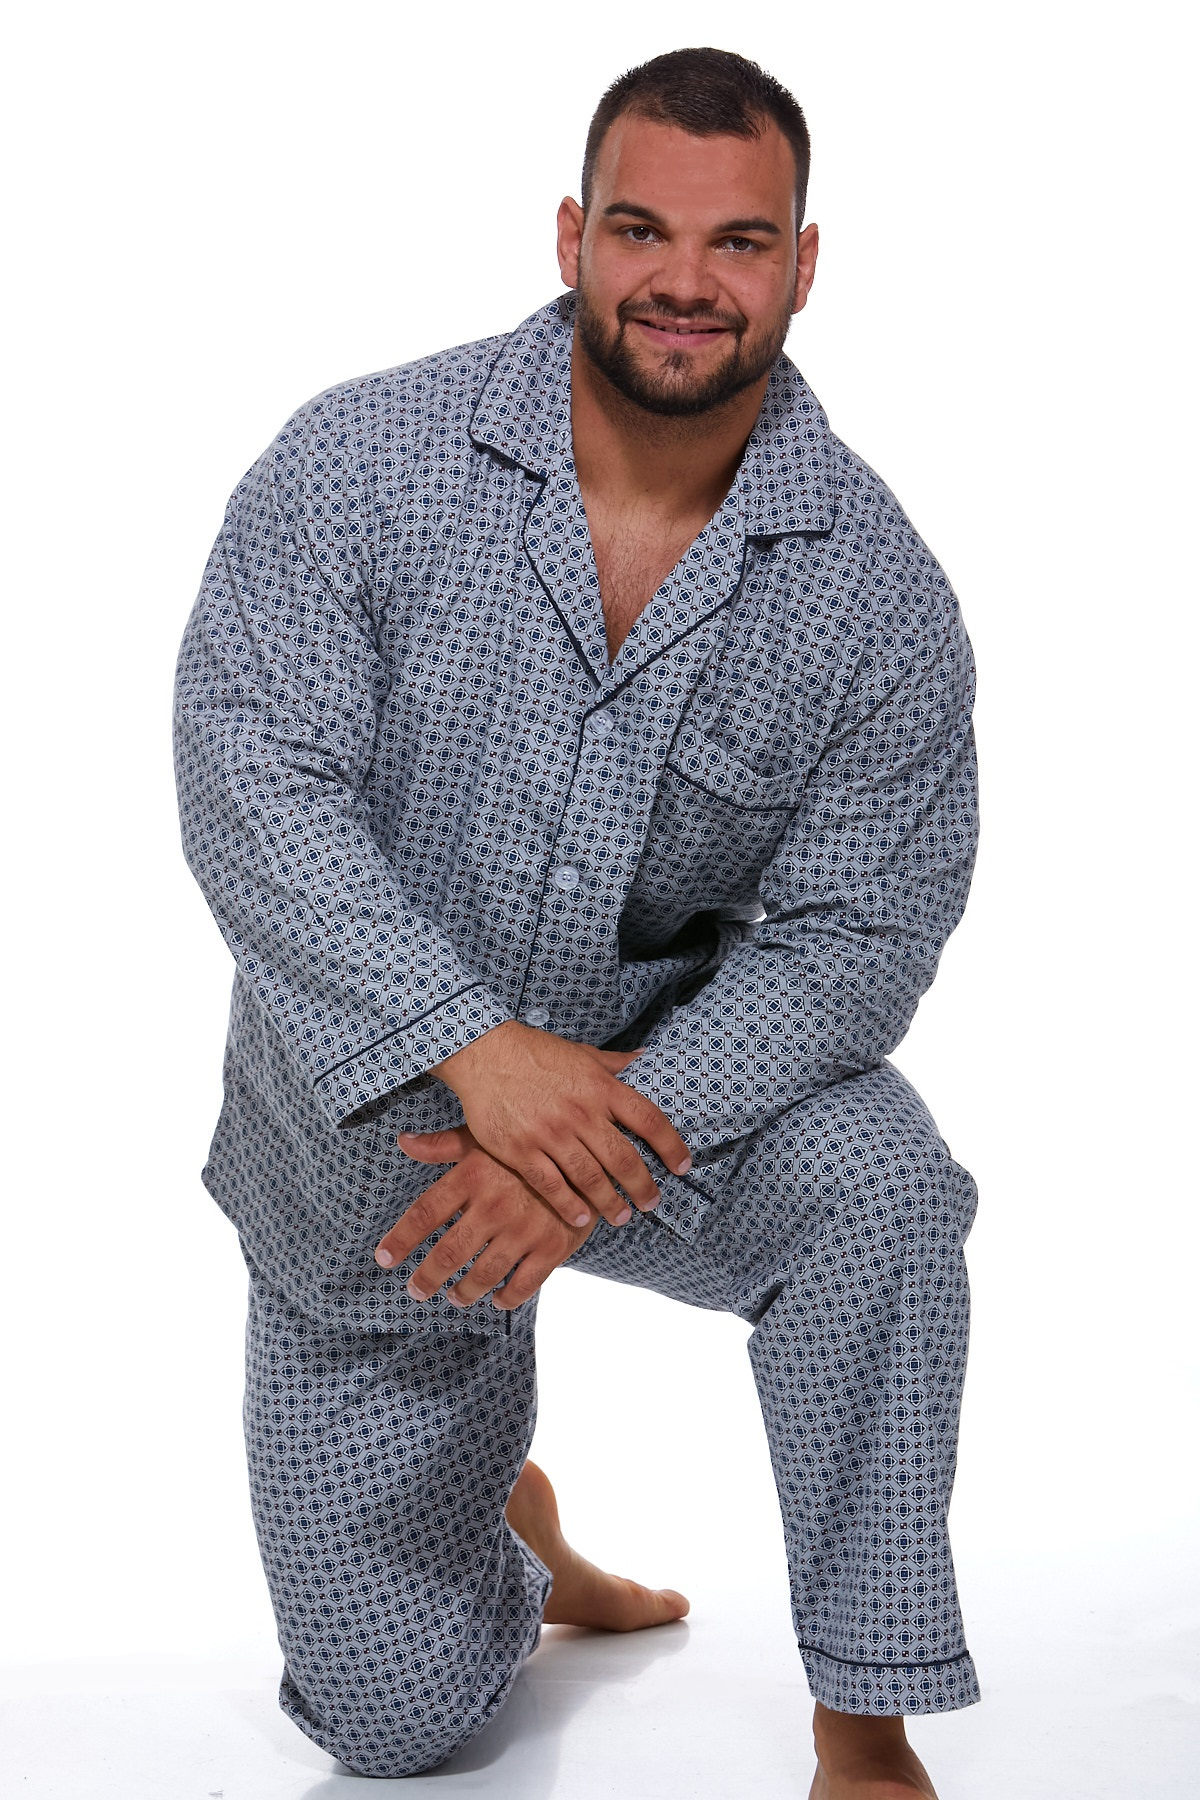 Pyžamo teplé pro muže PAPM430